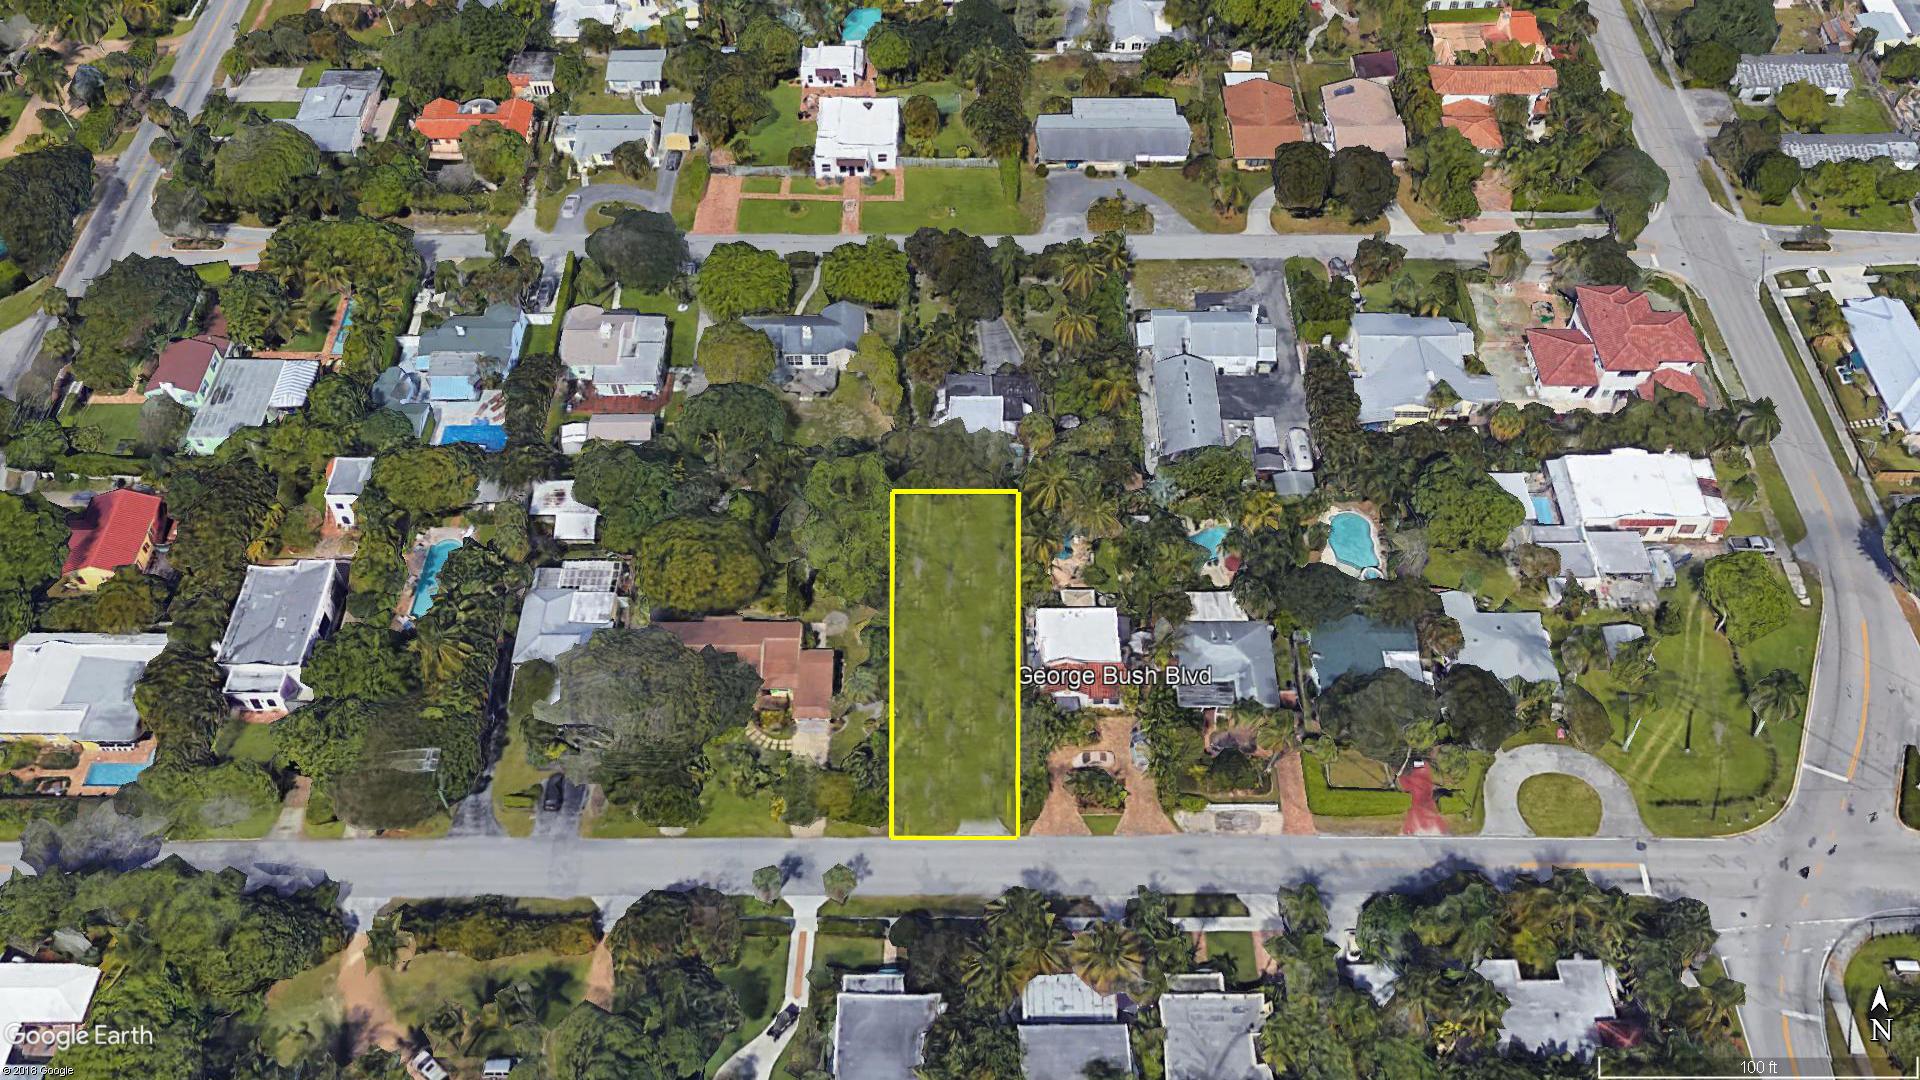 105 George Bush Boulevard  Delray Beach, FL 33444